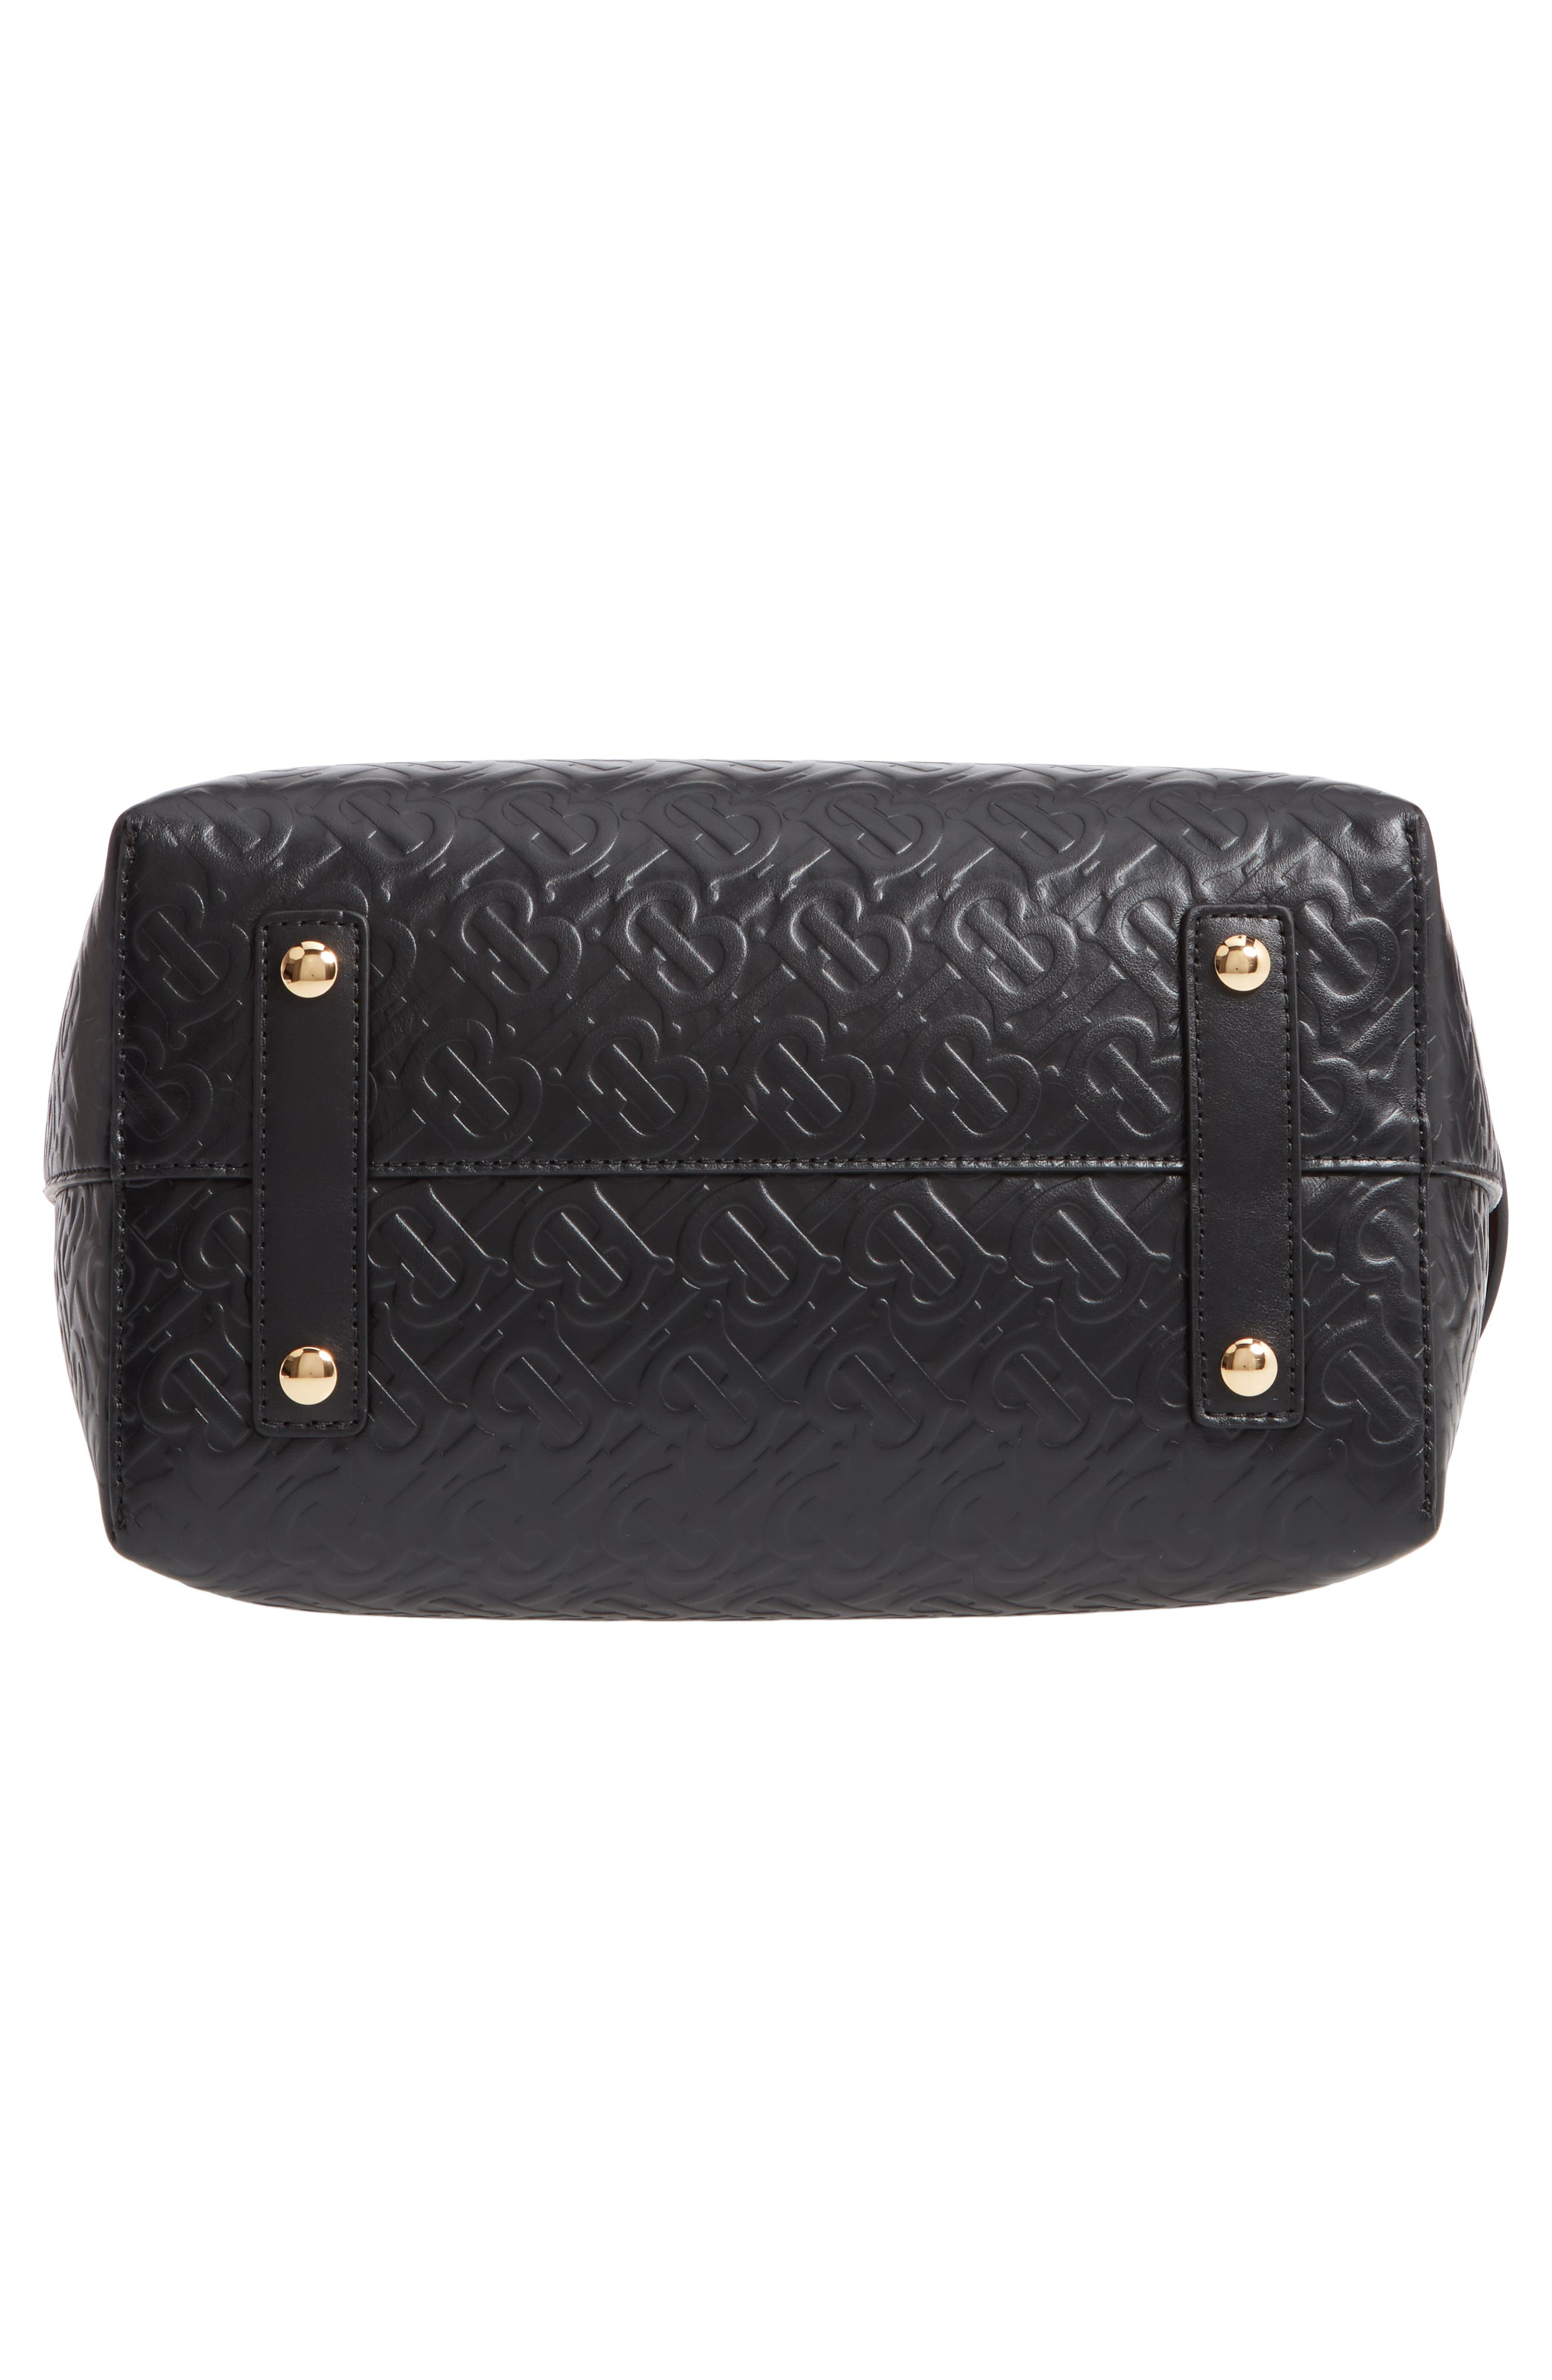 BURBERRY,                             Small Belt Embossed Logo Leather Satchel,                             Alternate thumbnail 6, color,                             BLACK